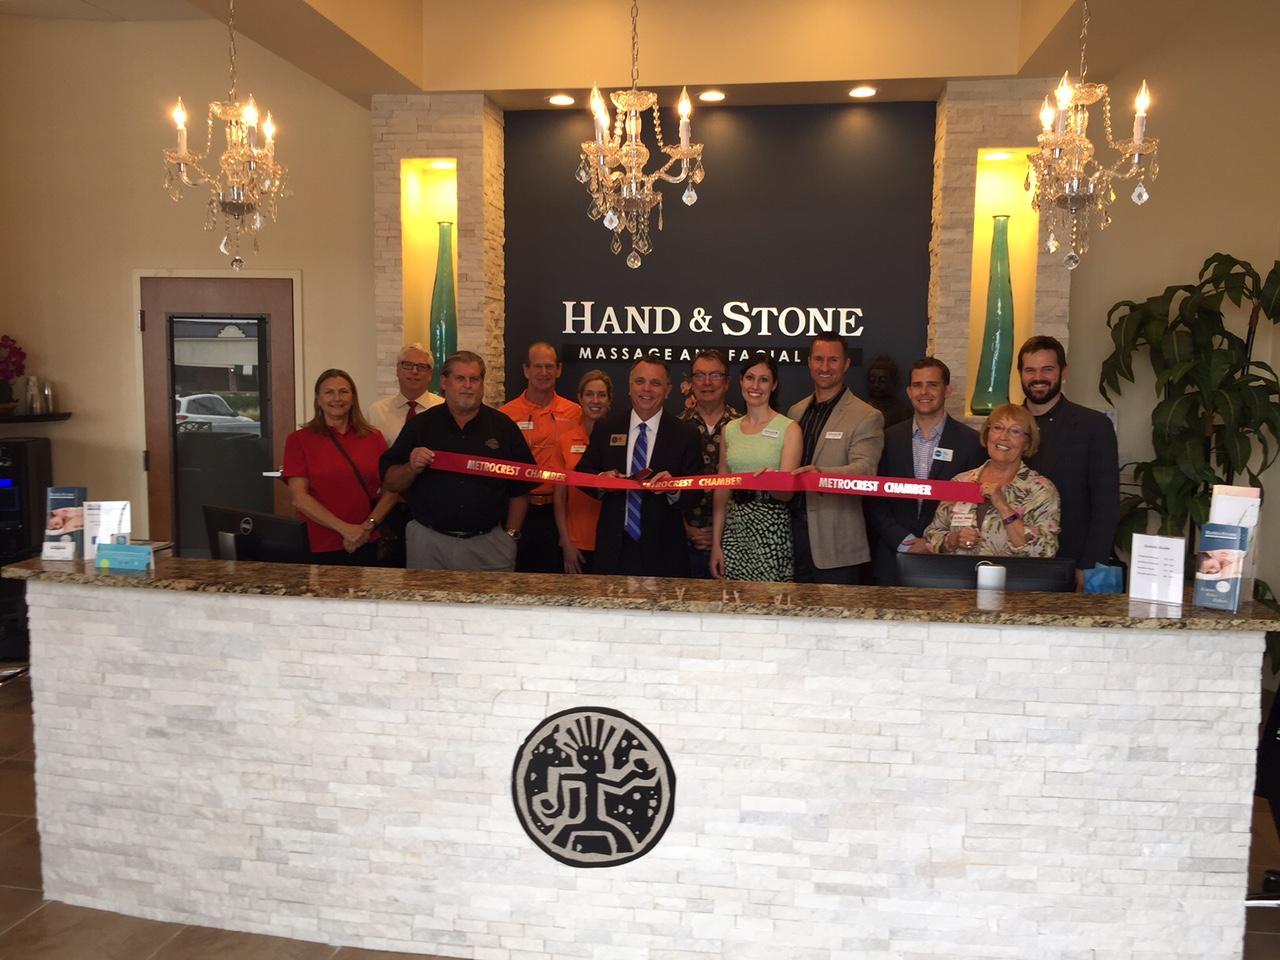 Dallas, TX Massage Therapist | Hand & Stone Massage and